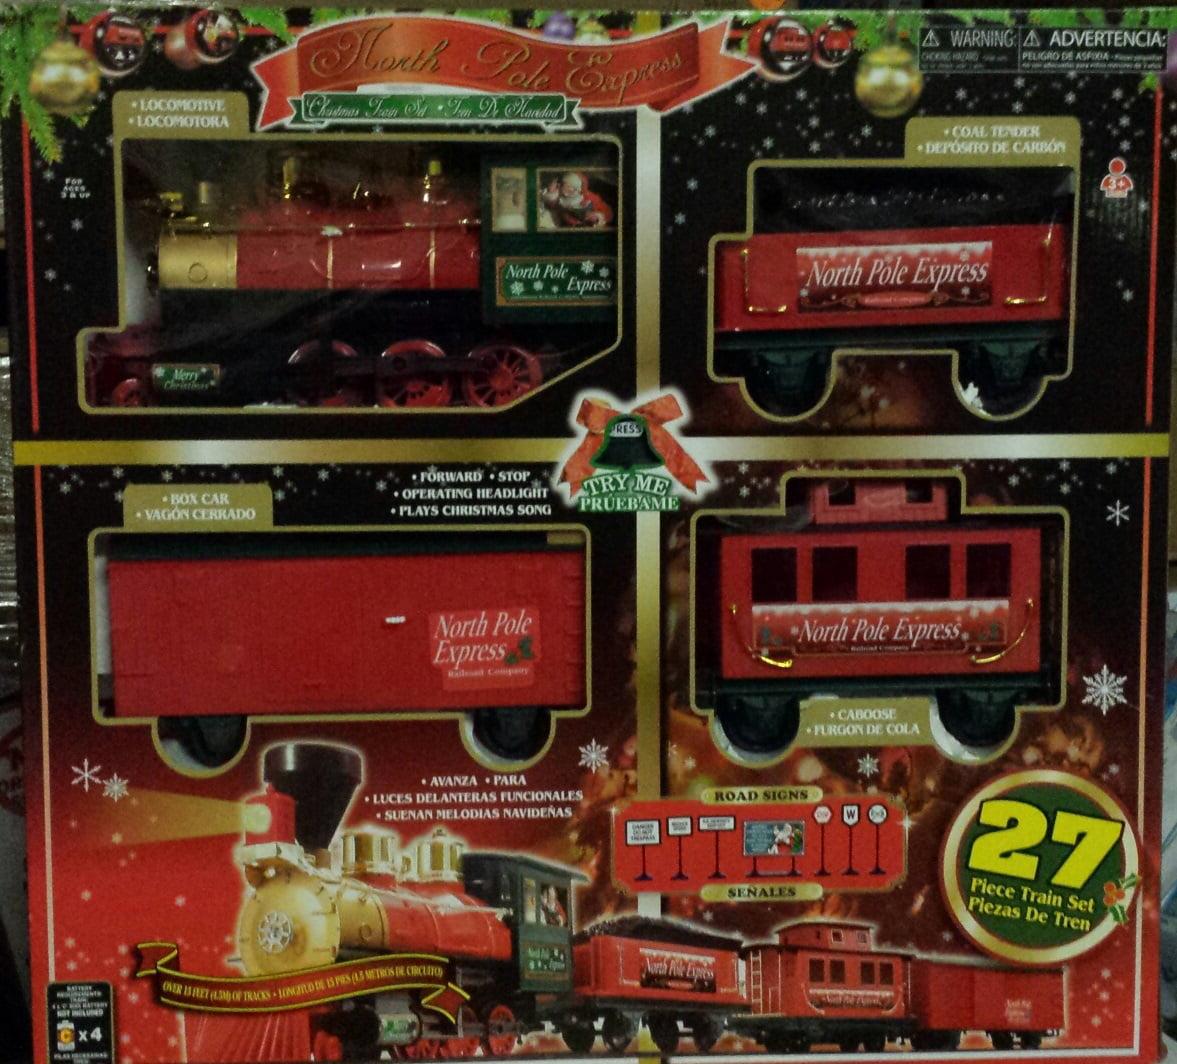 North Pole Express Christmas 27-Piece Train Set - Walmart.com